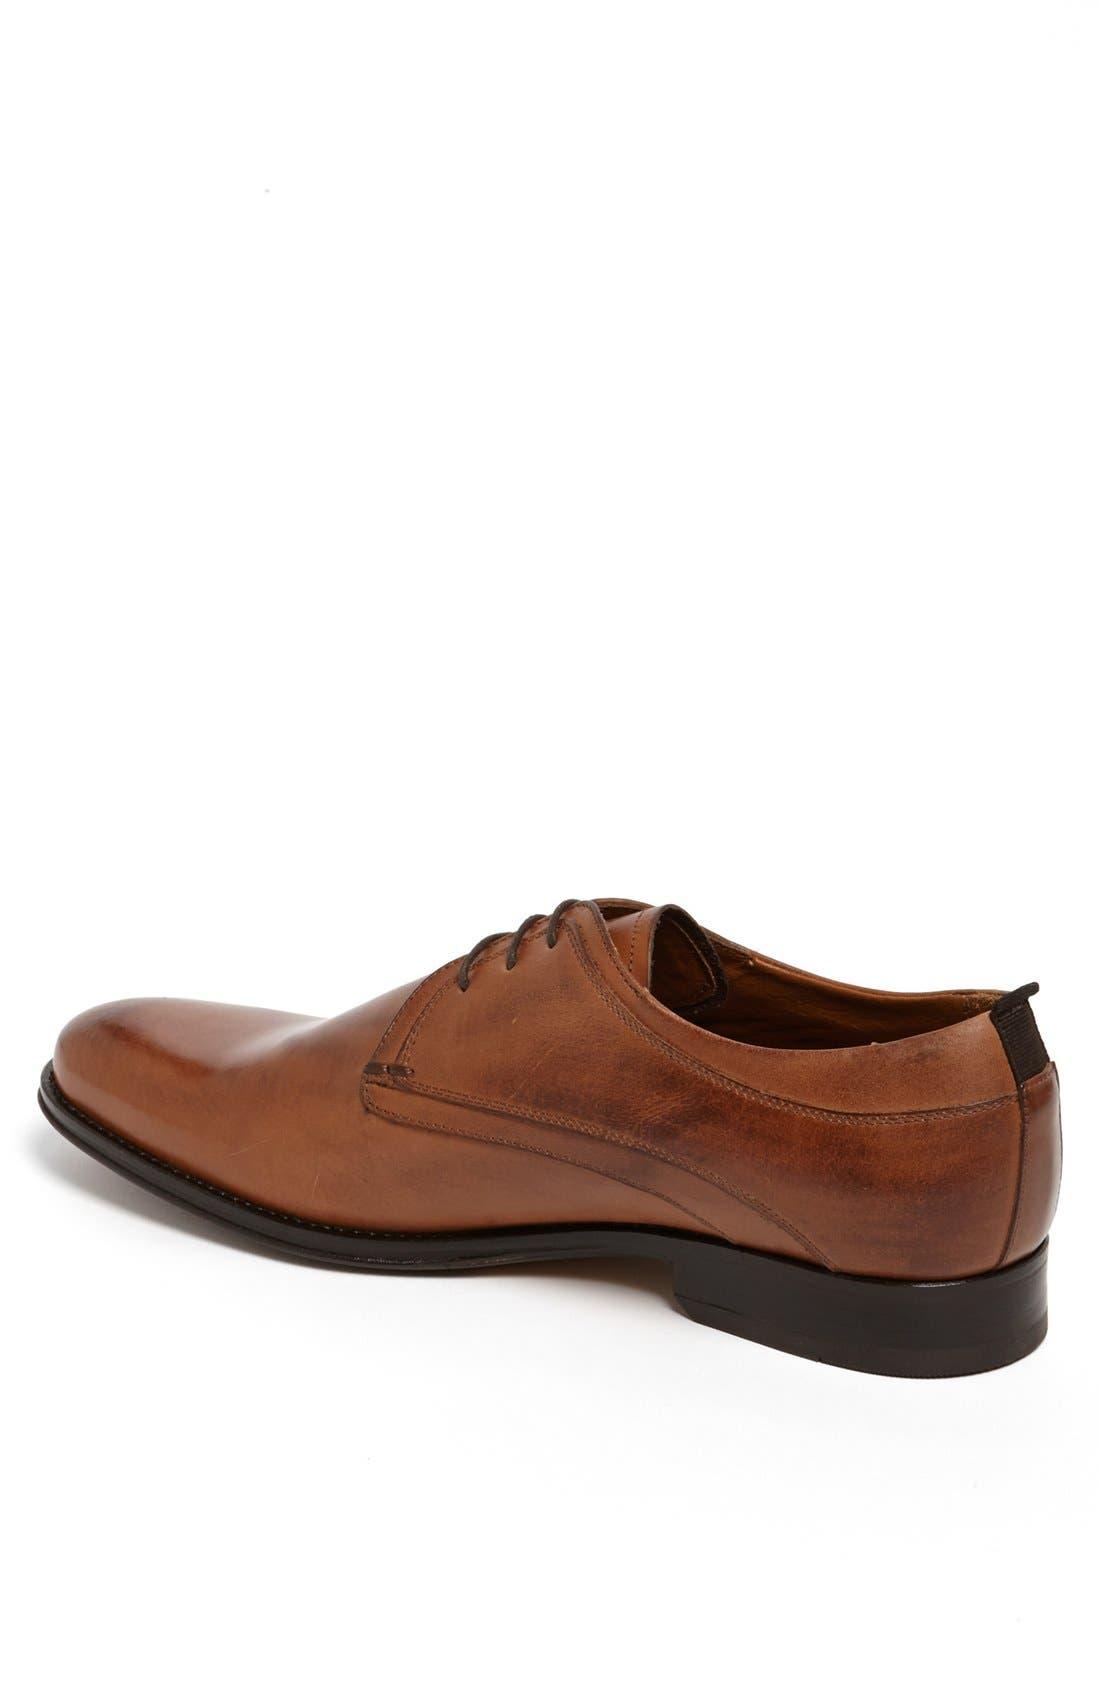 Alternate Image 2  - ALDO 'Tumma' Plain Toe Derby (Men)